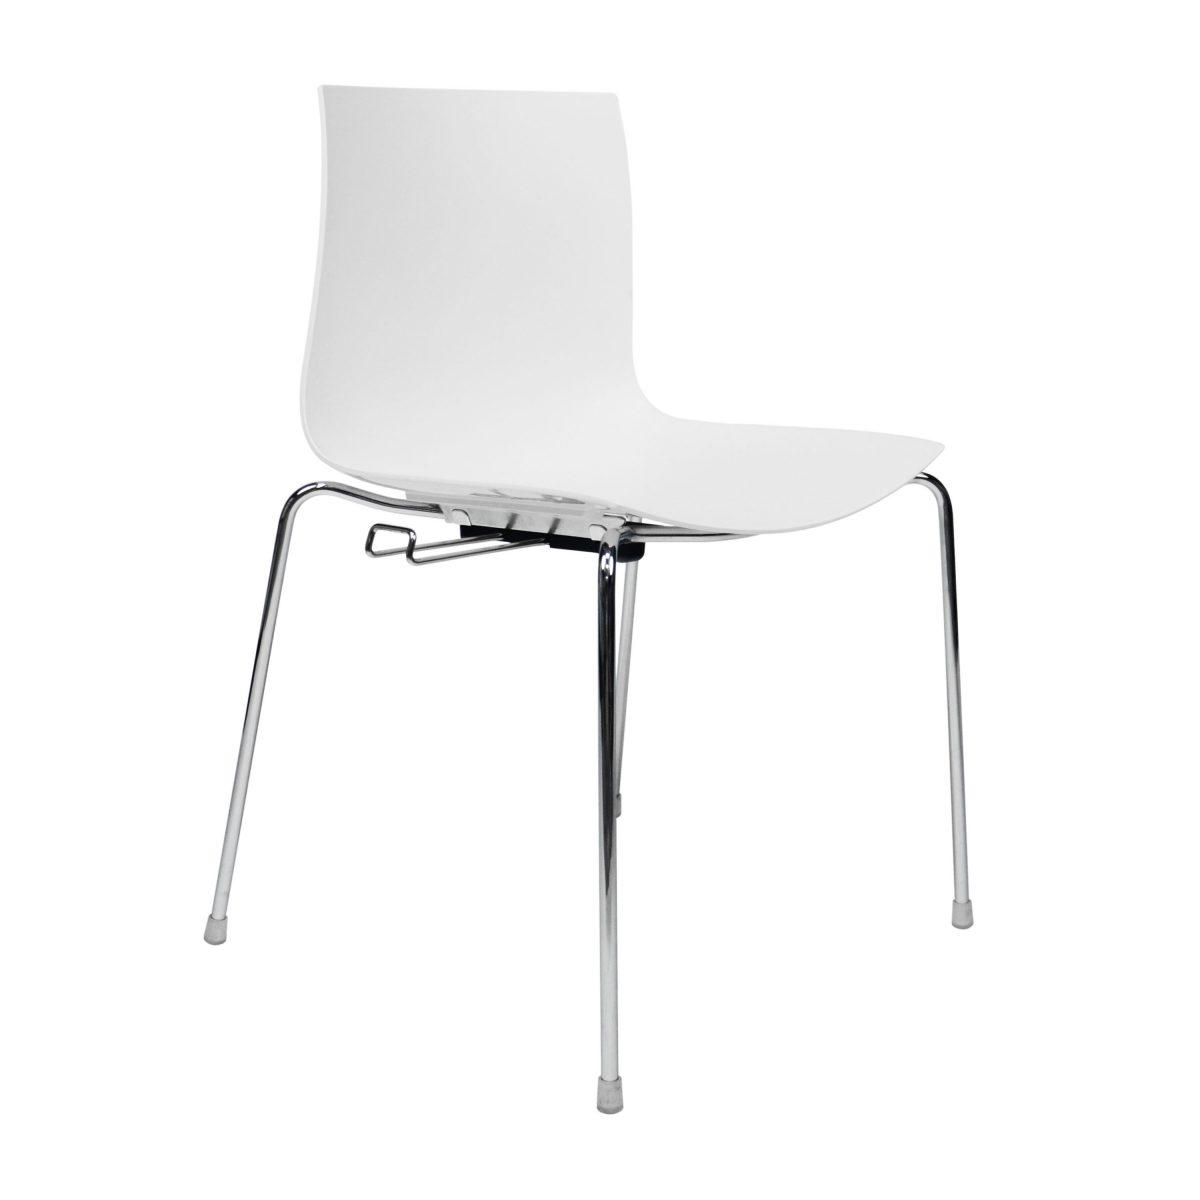 Chair Arper Catifa / Lievore Altherr Molina